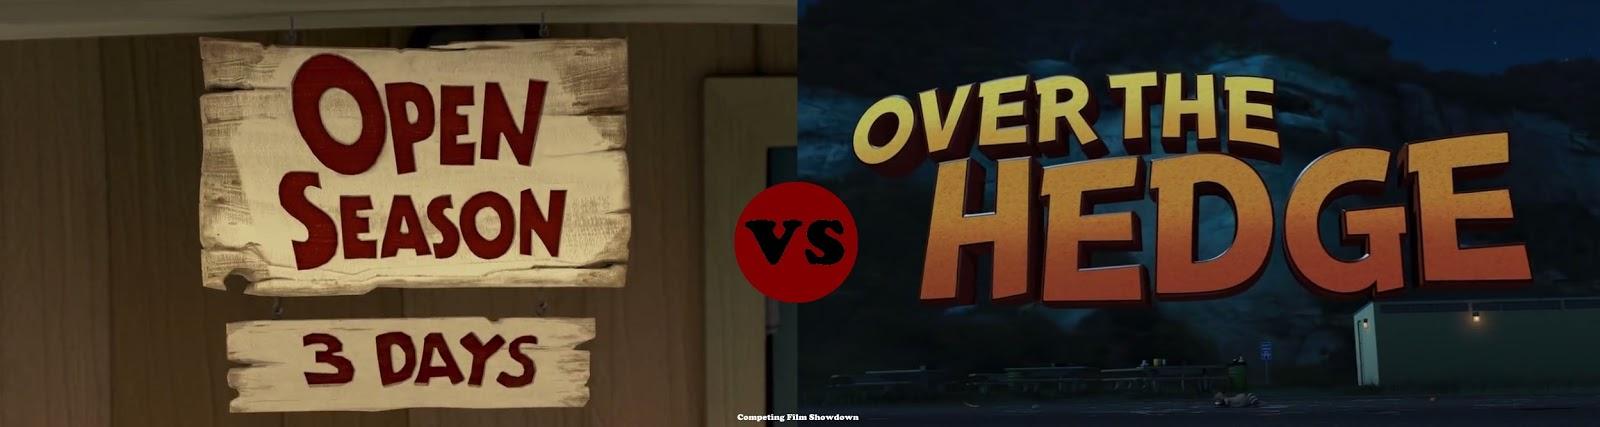 7877bfa39 Competing Film Showdown  COMPETING FILMS - Open Season (2006) vs ...